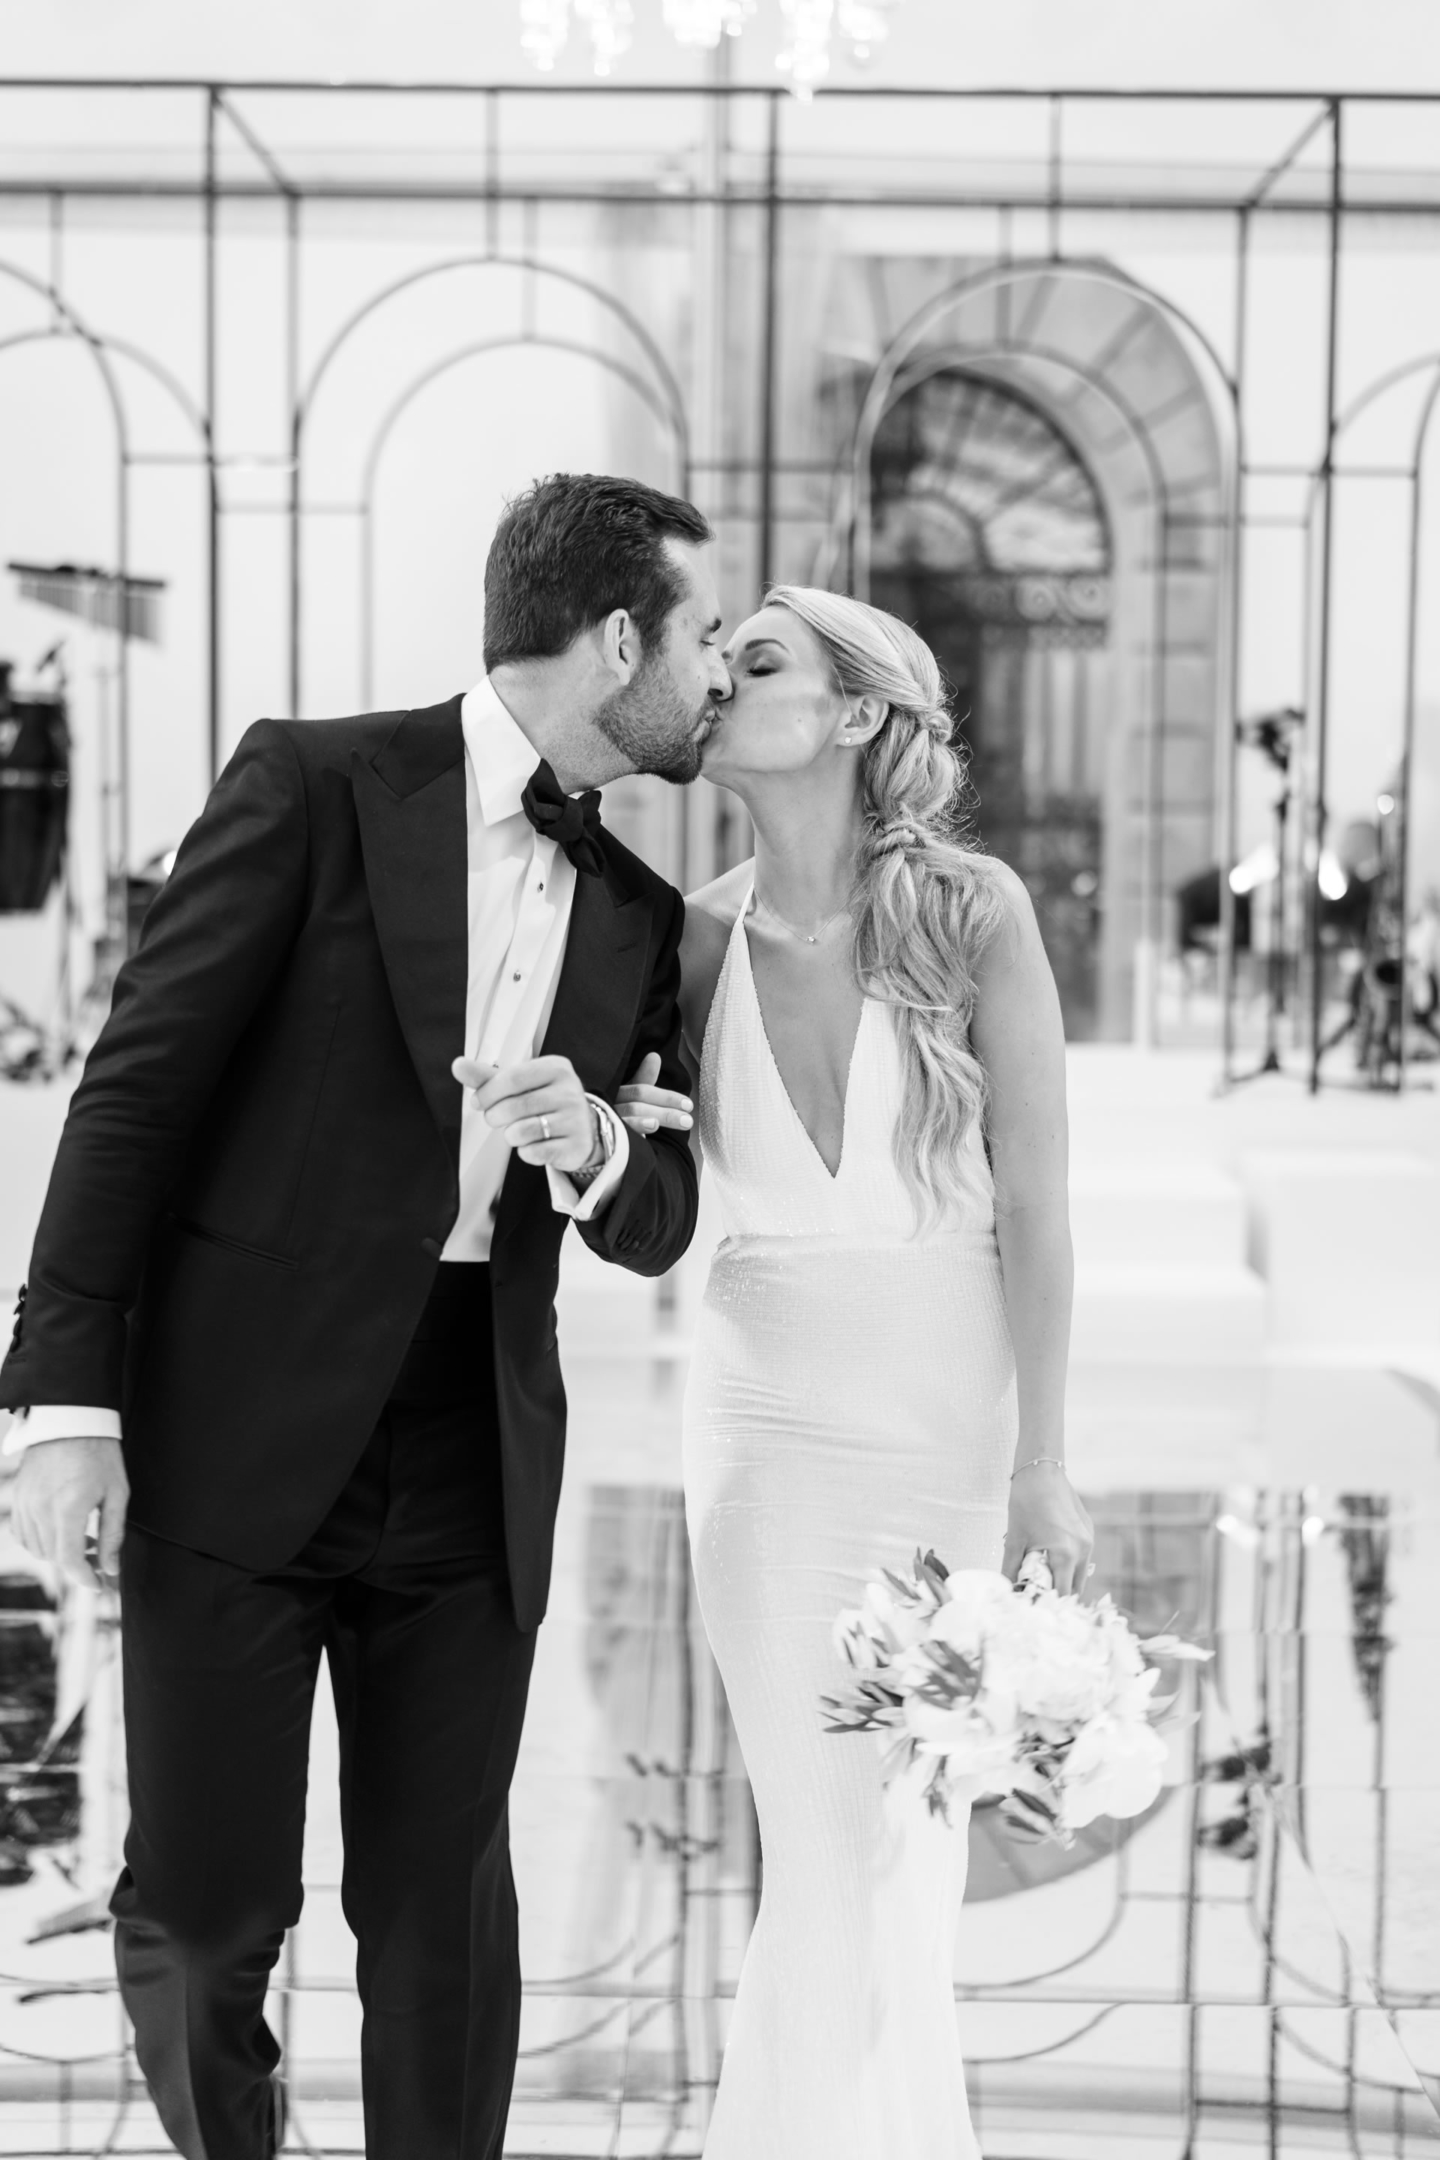 A sparkling wedding in the shore of the Arno - 81 :: A sparkling wedding on the shore of the Arno :: Luxury wedding photography - 80 :: A sparkling wedding in the shore of the Arno - 81